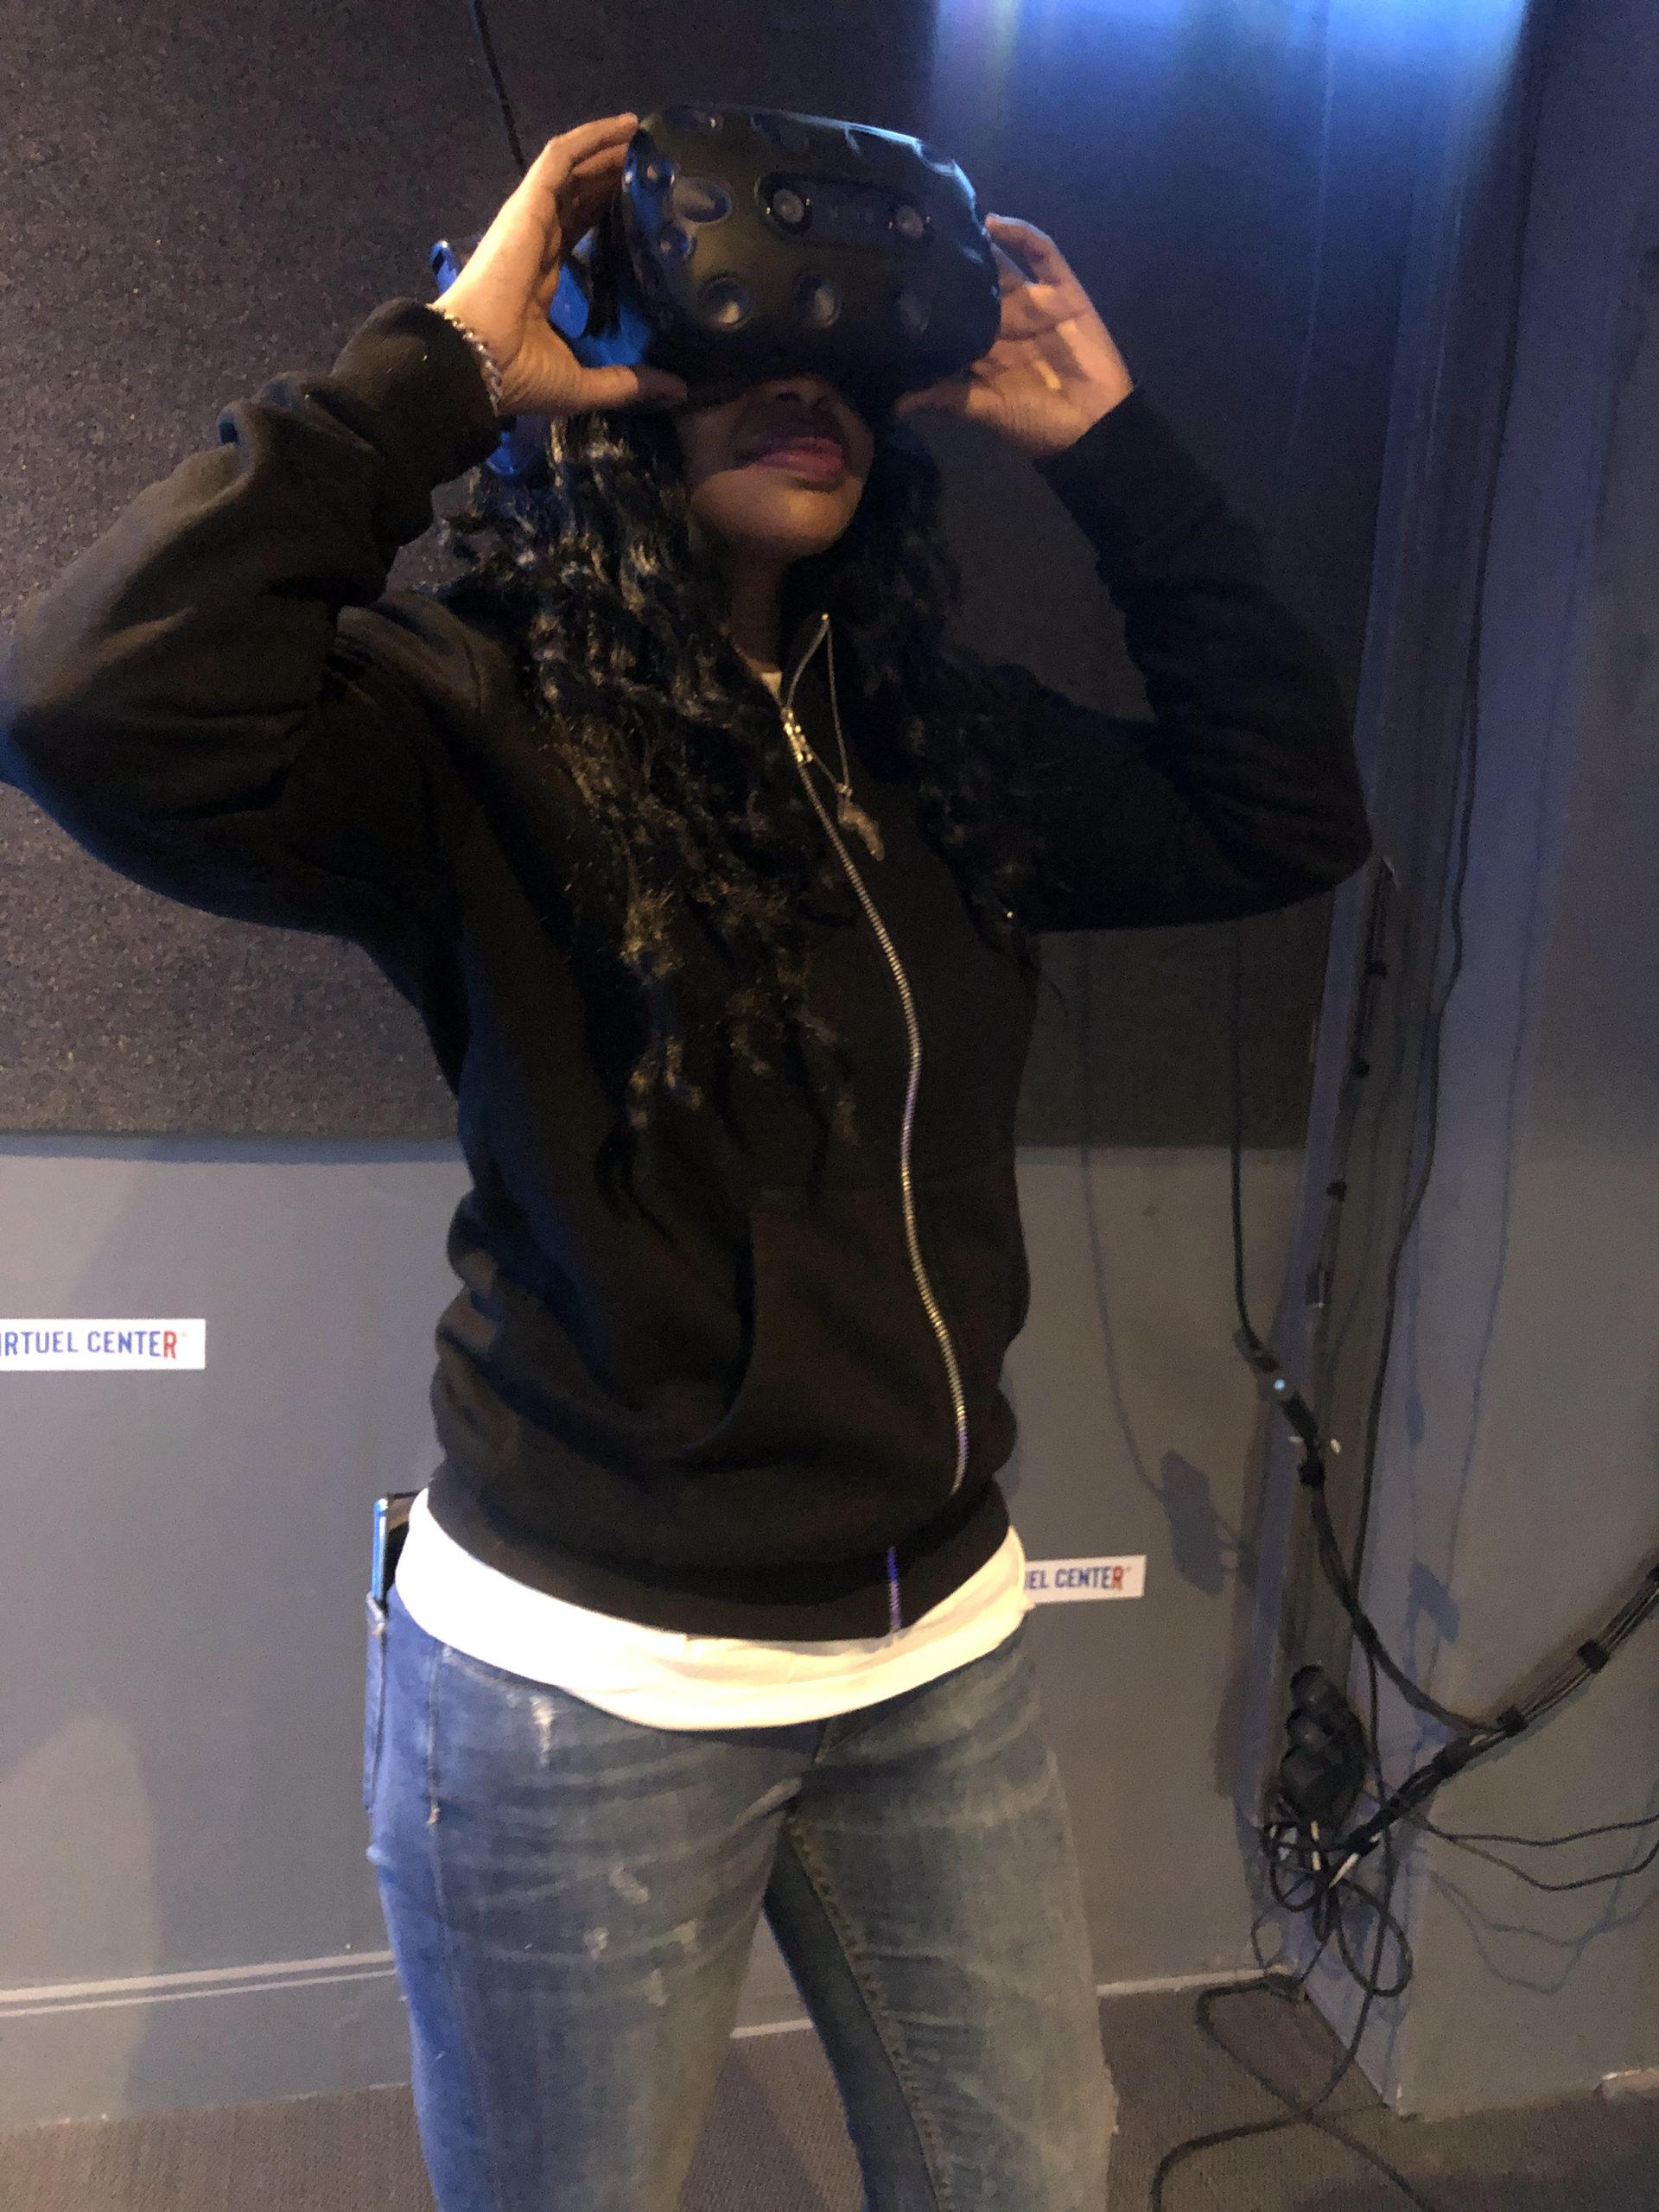 virtuel center paris realite virtuelle 06